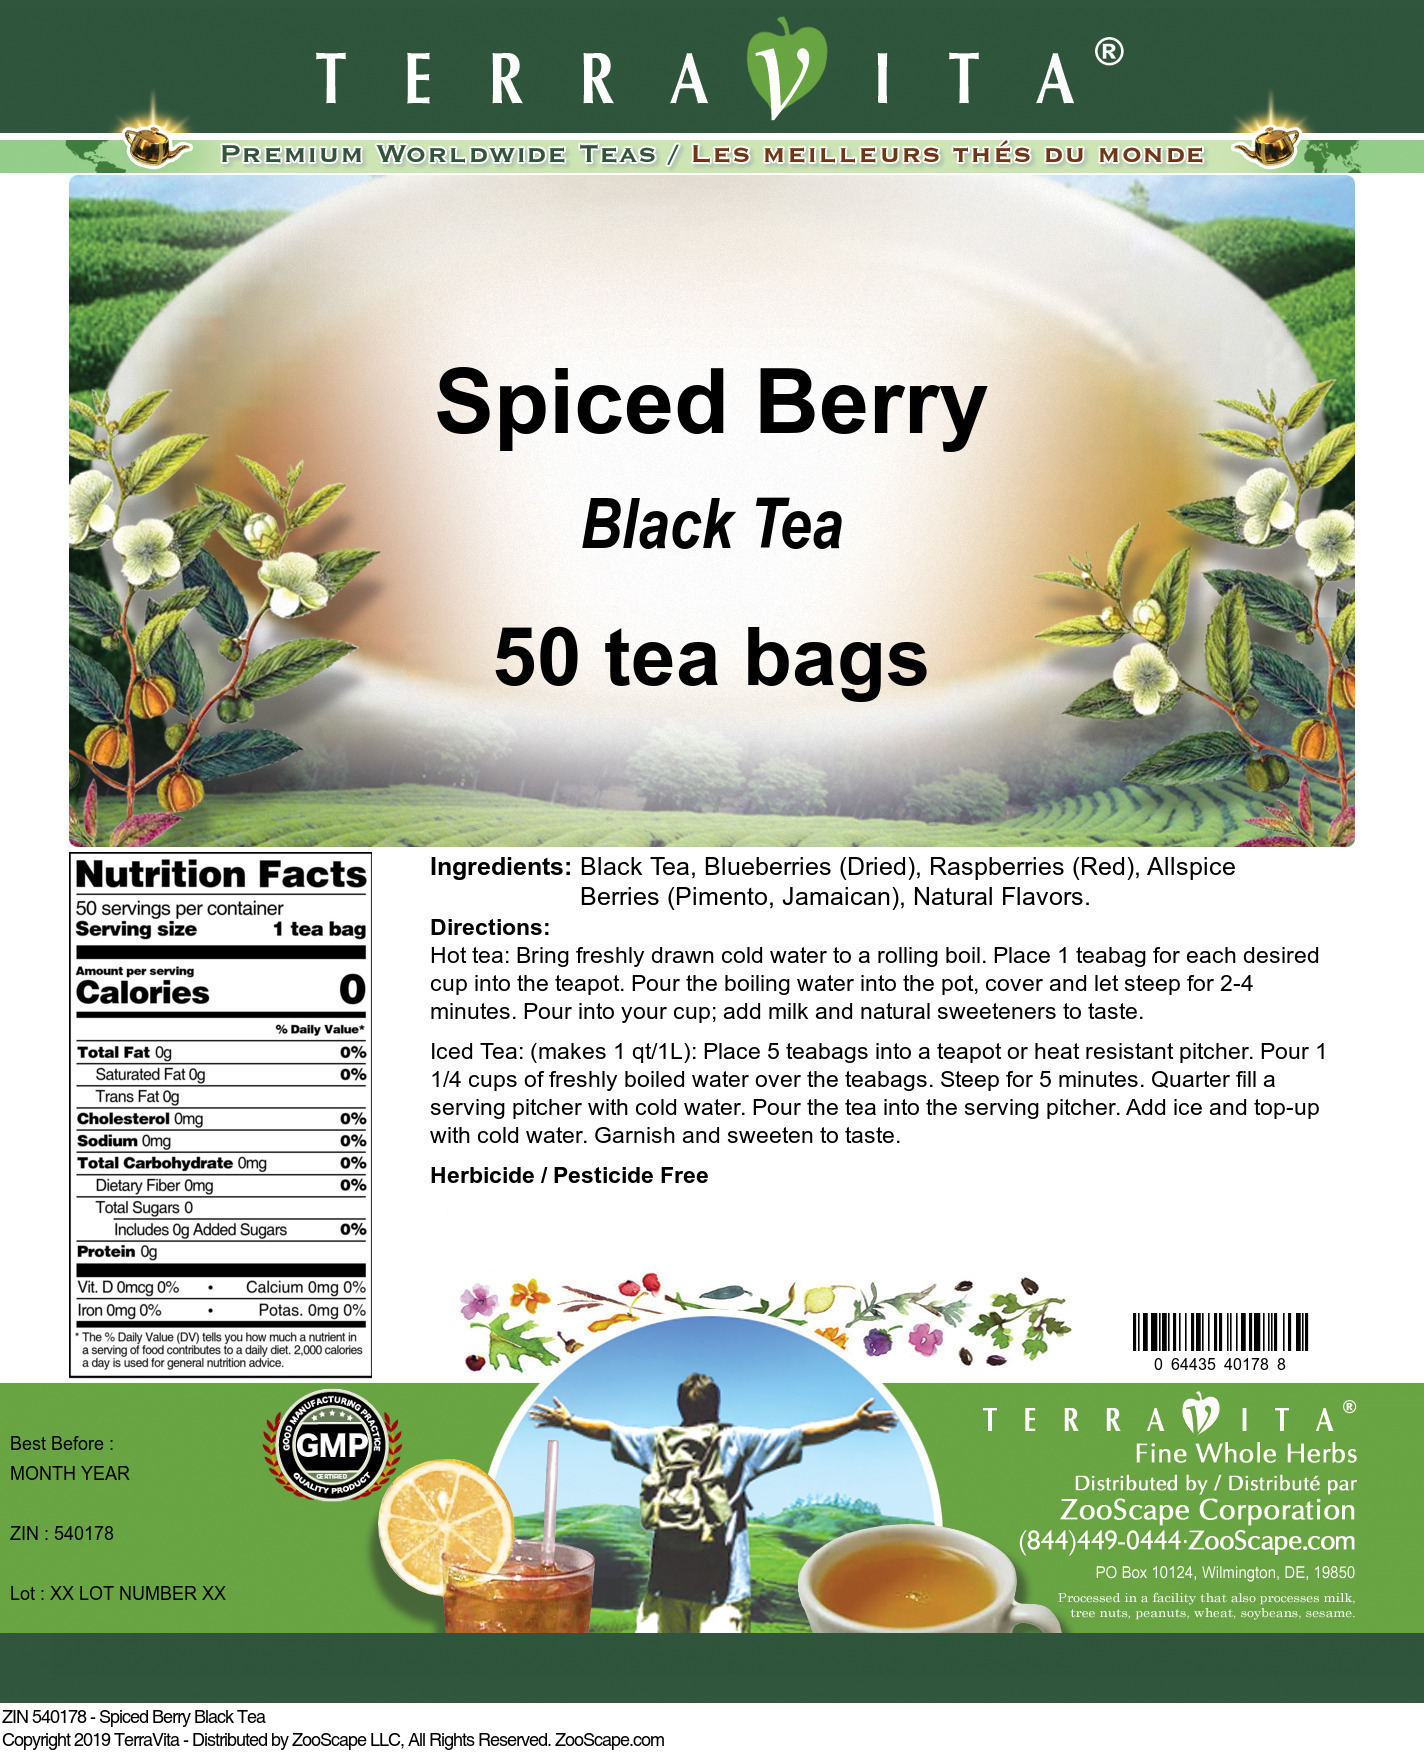 Spiced Berry Black Tea